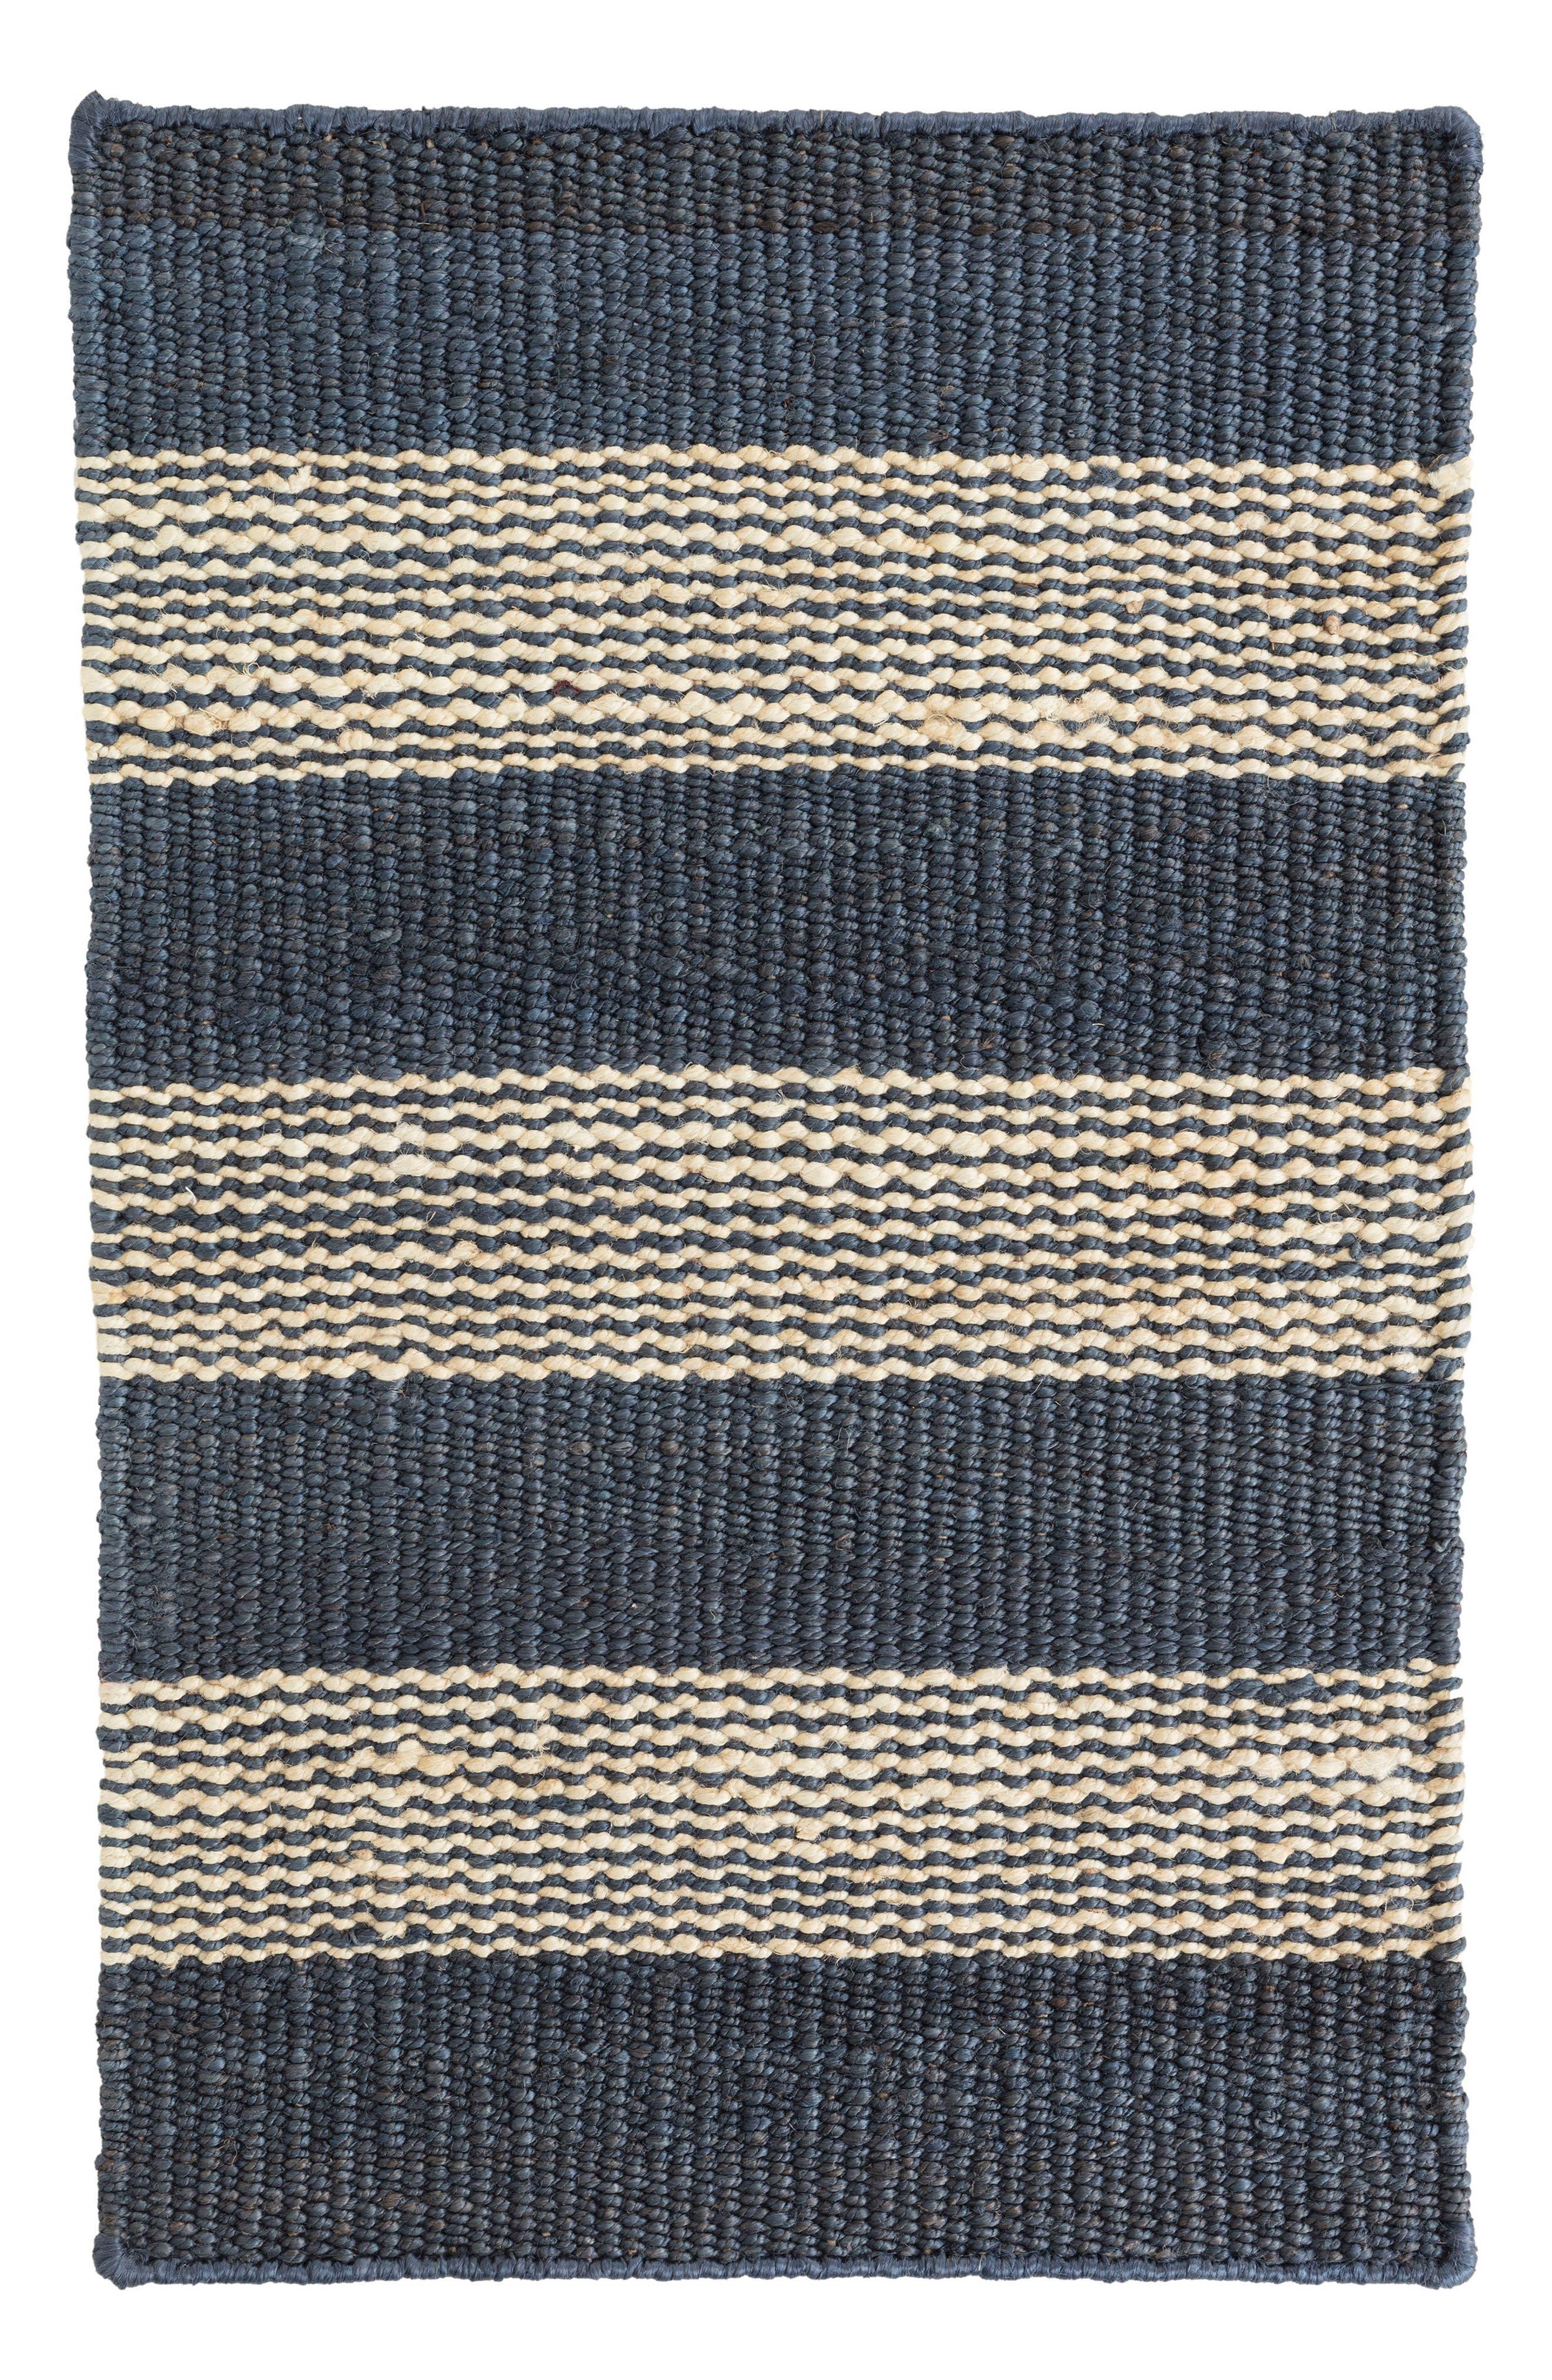 Denim Ticking Woven Rug,                             Main thumbnail 1, color,                             Blue